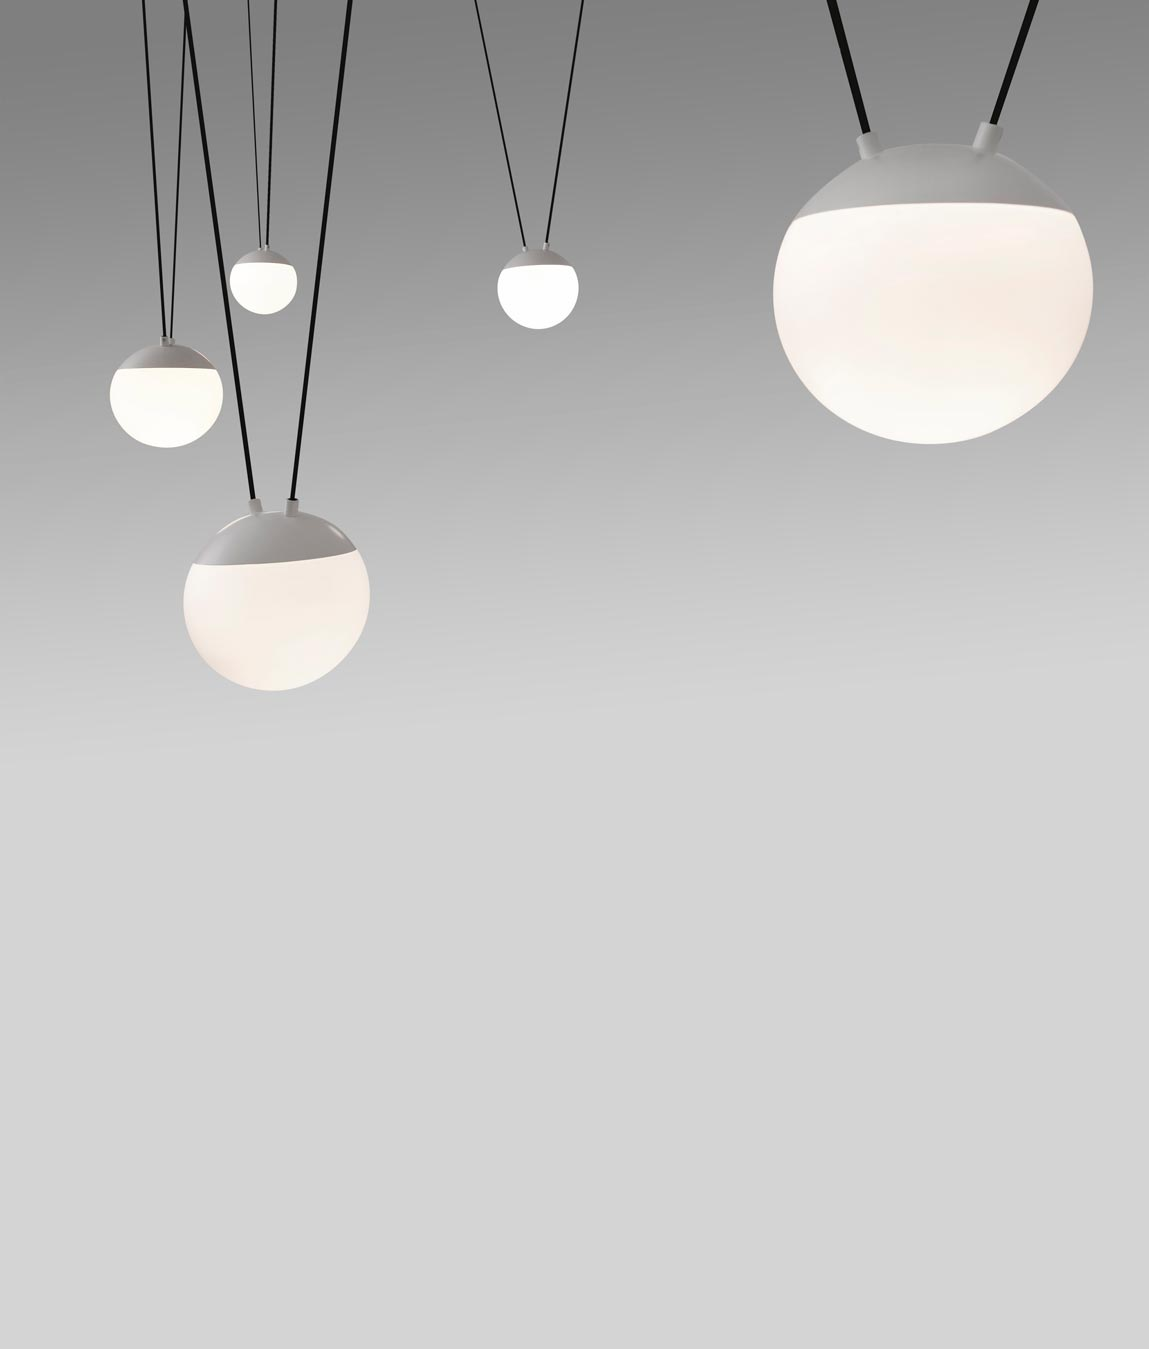 Lámpara de techo blanca 5 luces MINE detalle